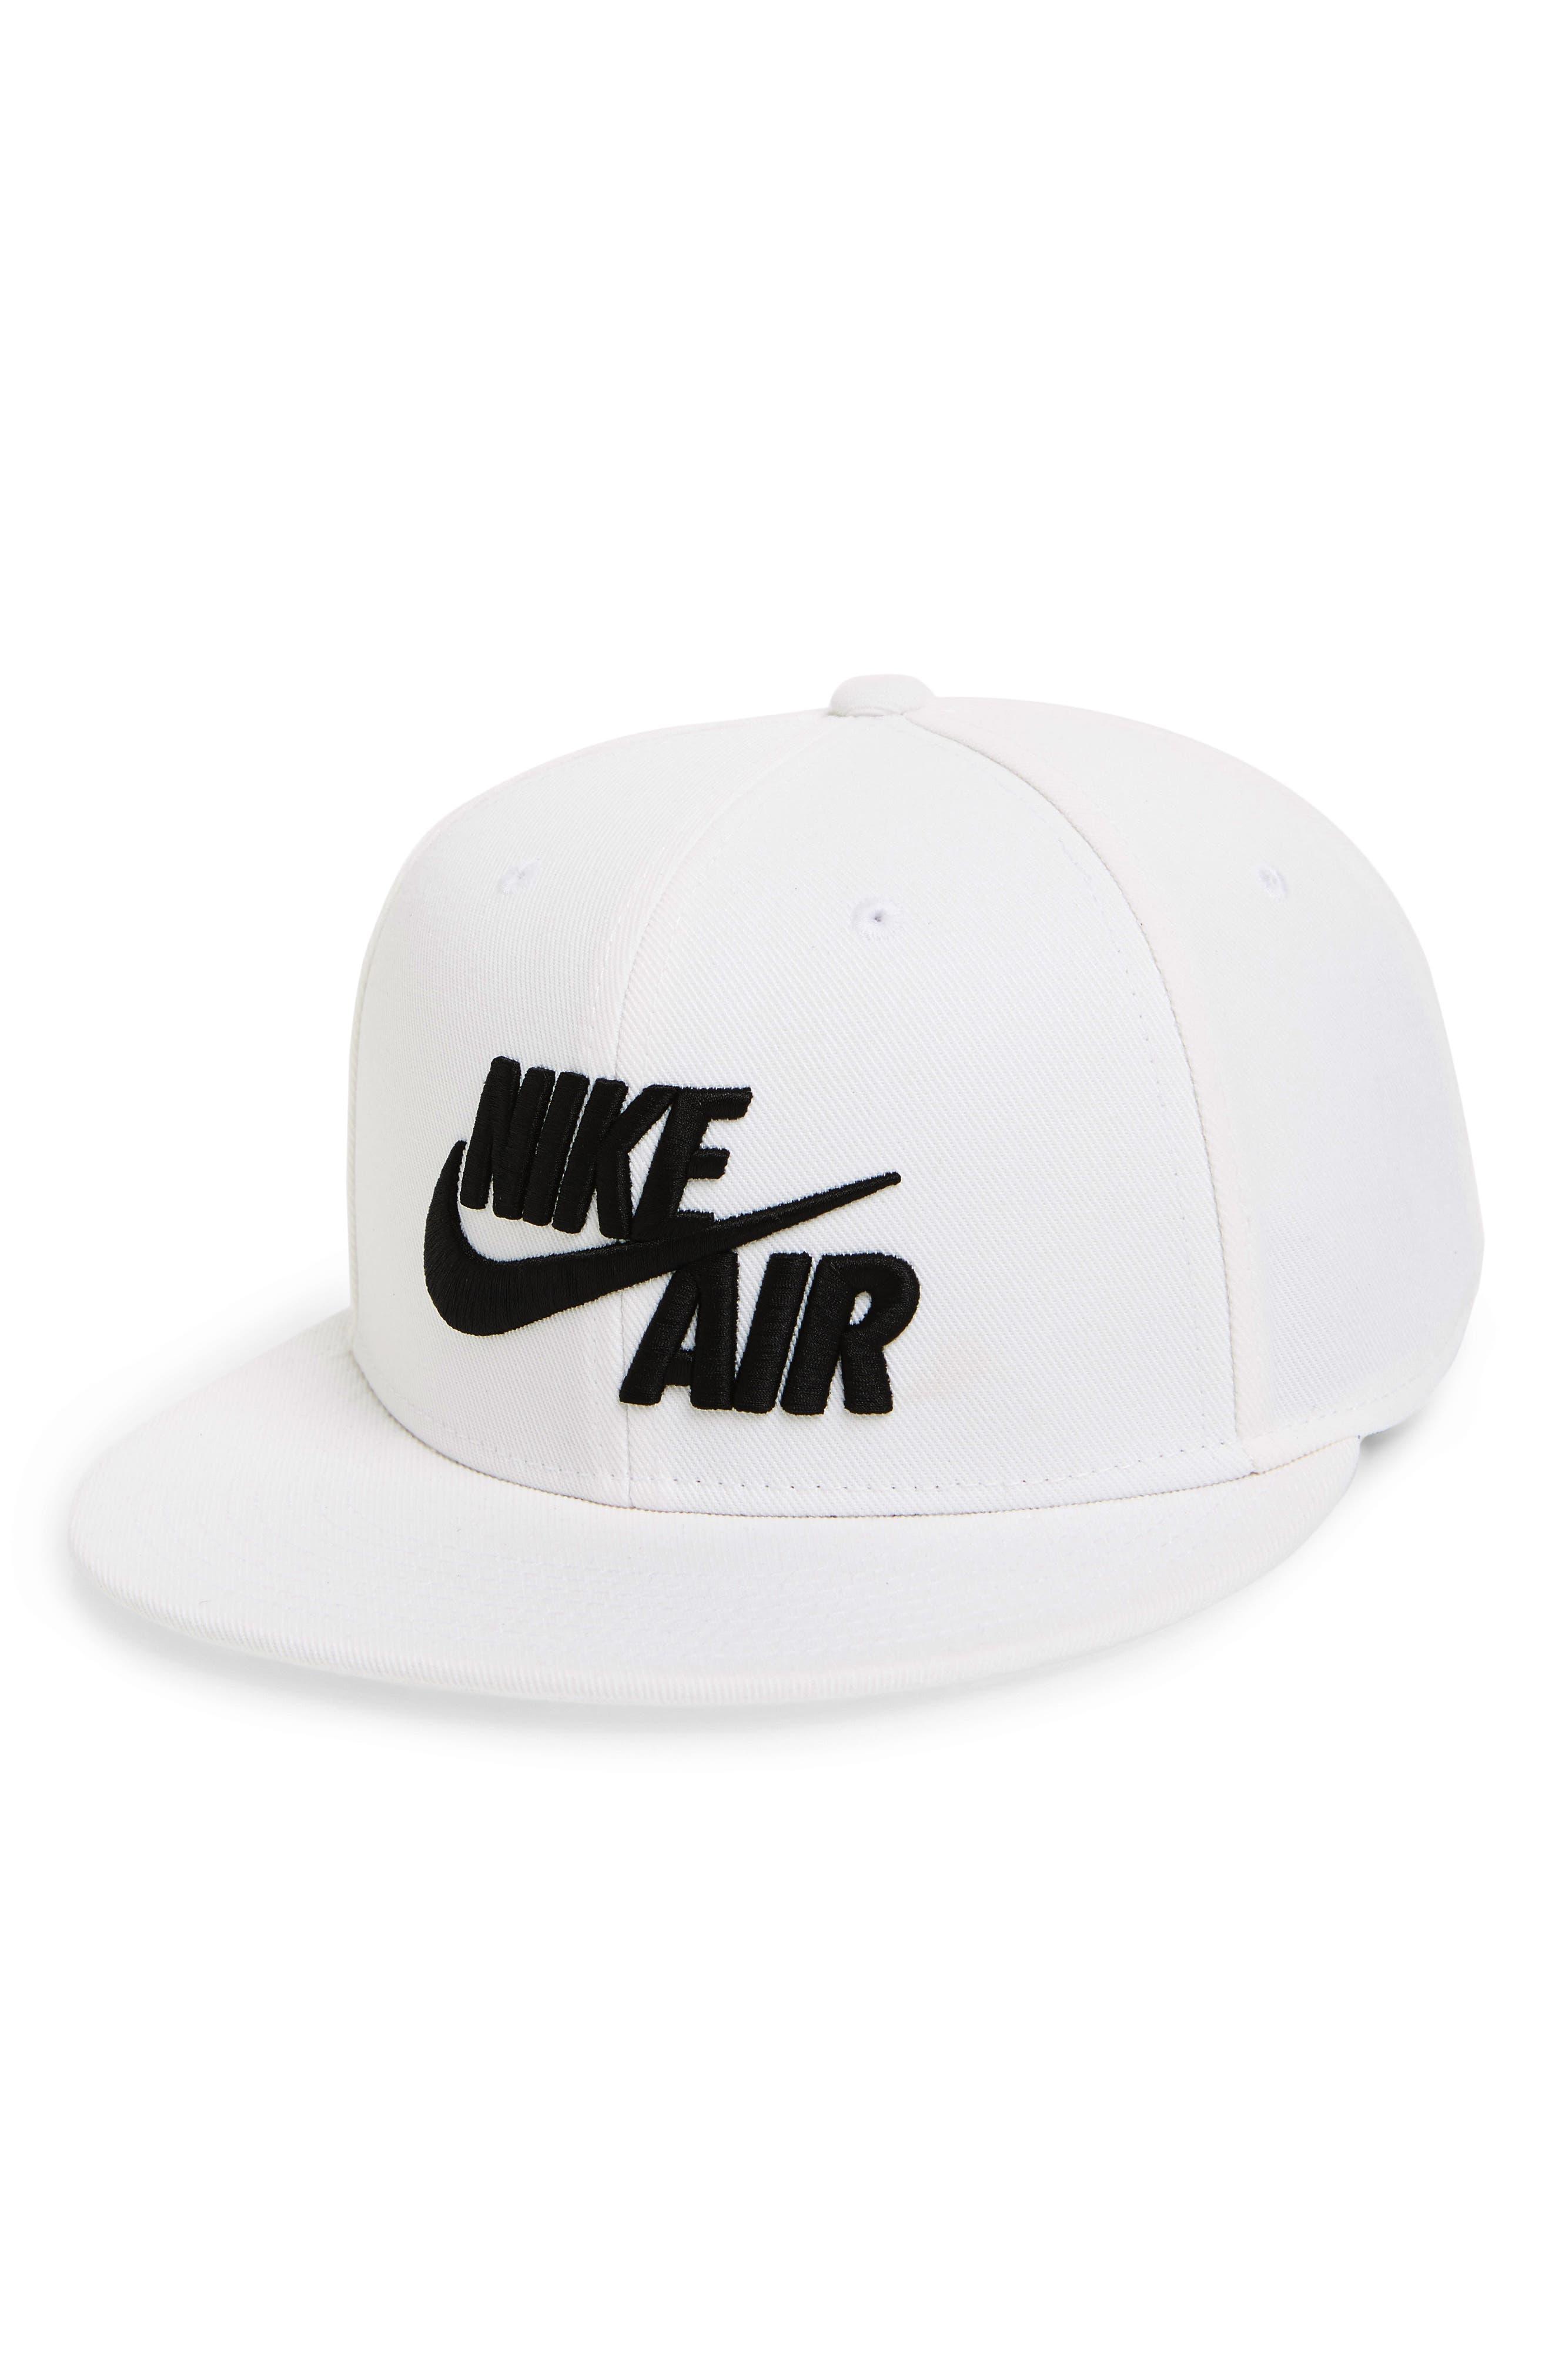 28e83bc8690 ... release date nike air true snapback baseball cap e5bd4 65b75